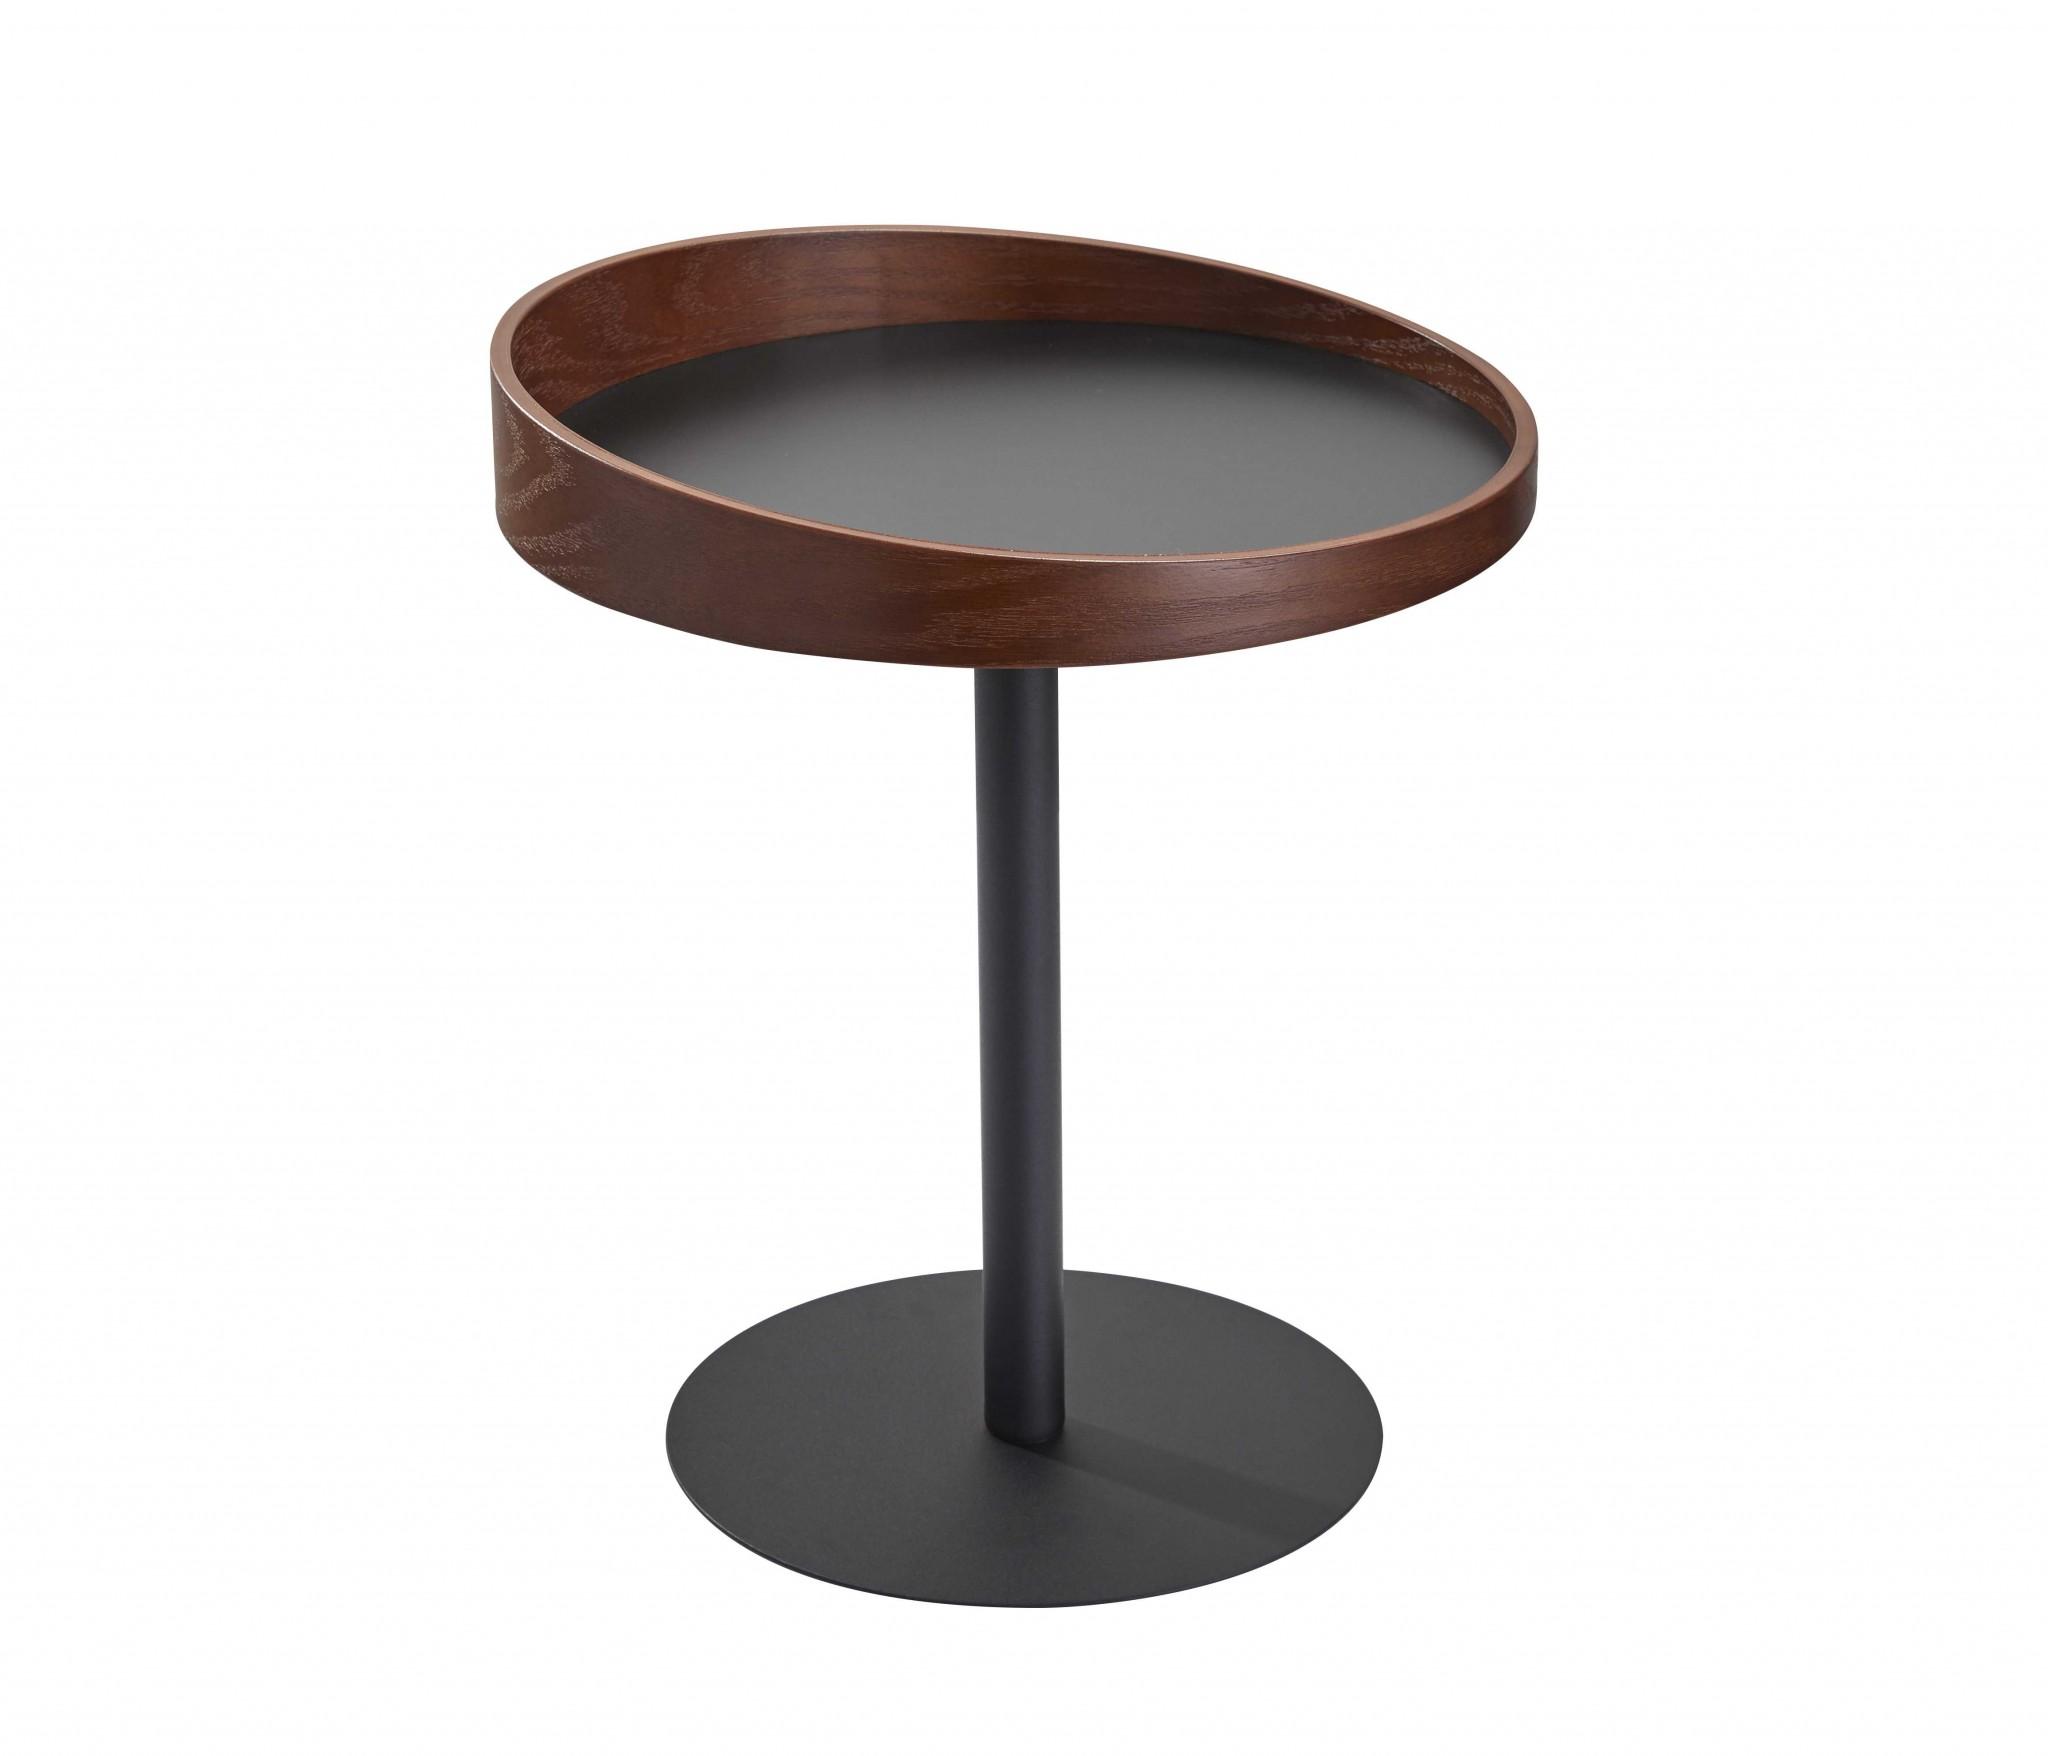 "18"" X 18"" X 20-21.5"" Black  End Table"